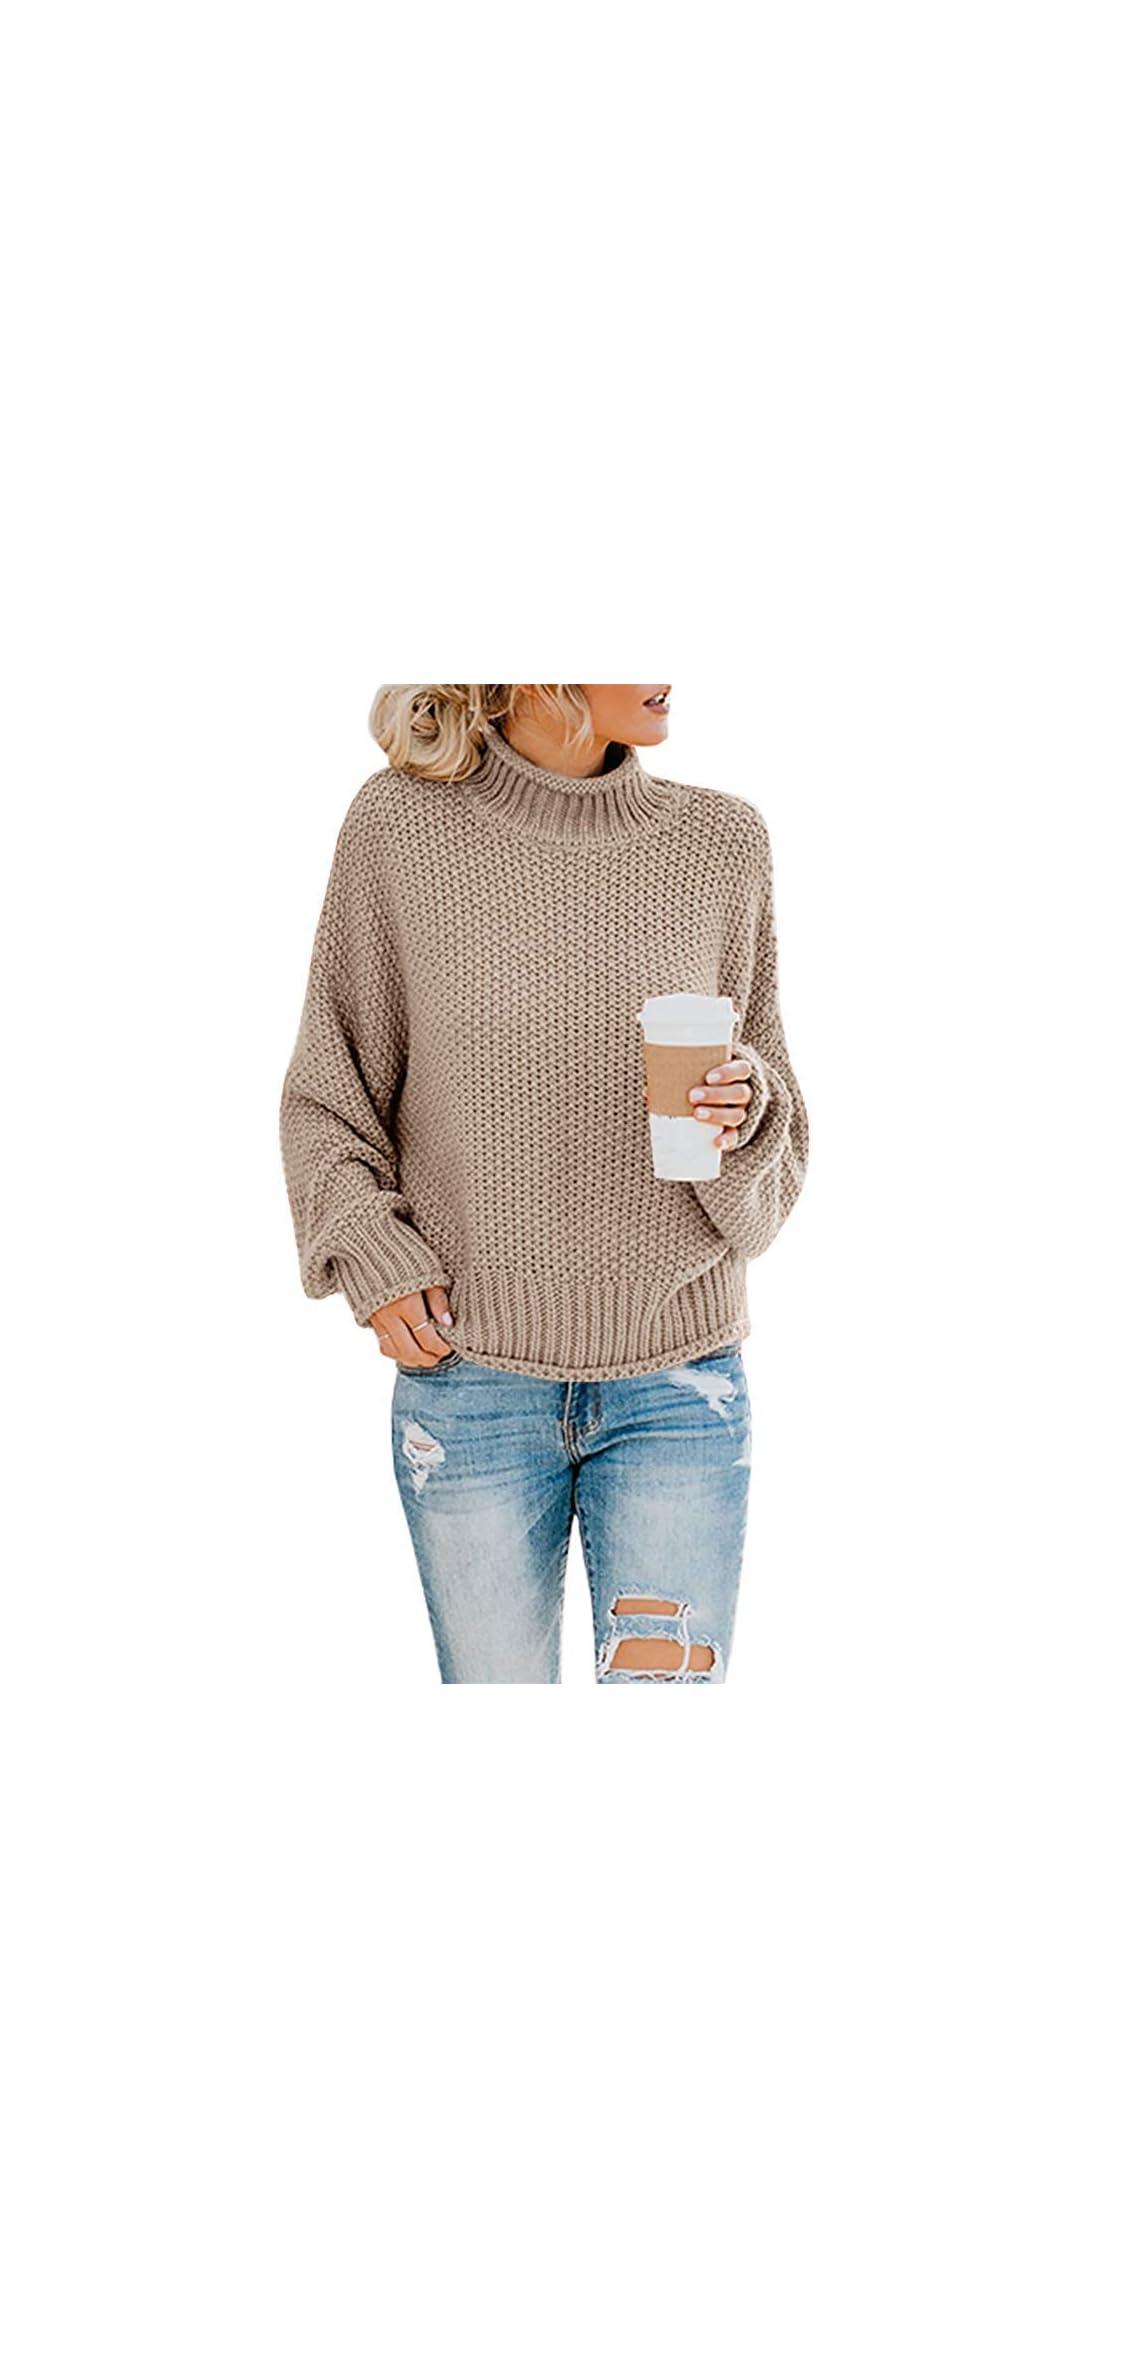 Womens Oversized Sweater Long Sleeve Loose Warm Chunky